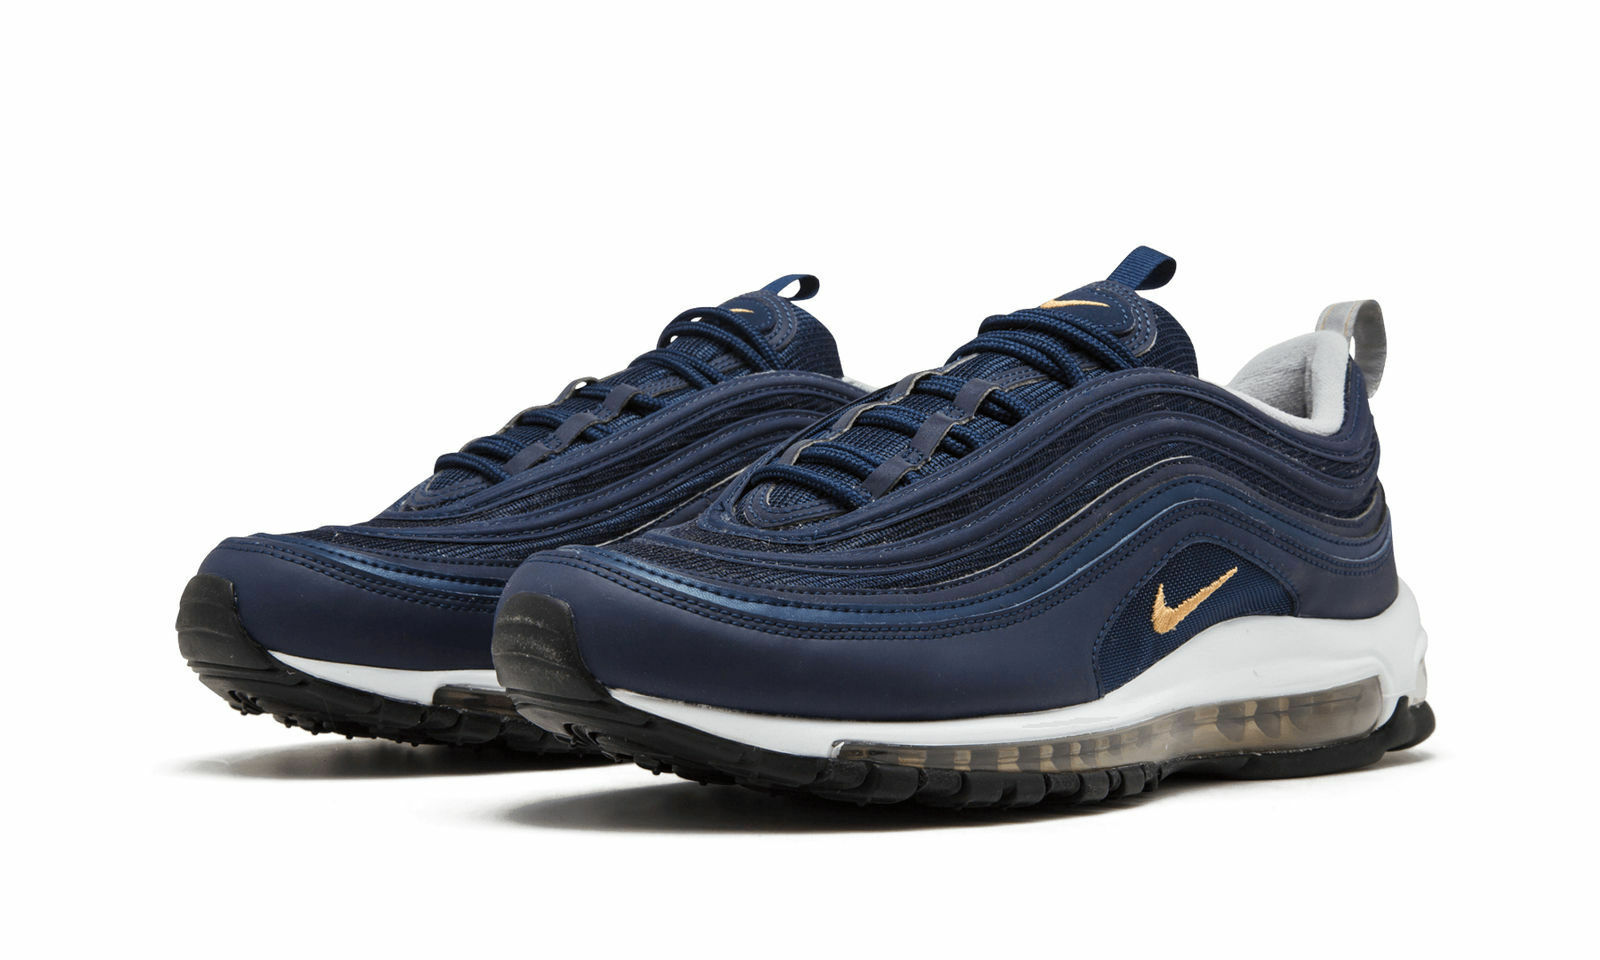 Nike Air Max 97 Men's Size 7.5-15 Midnight Navy Metallic Gold White 921826-400